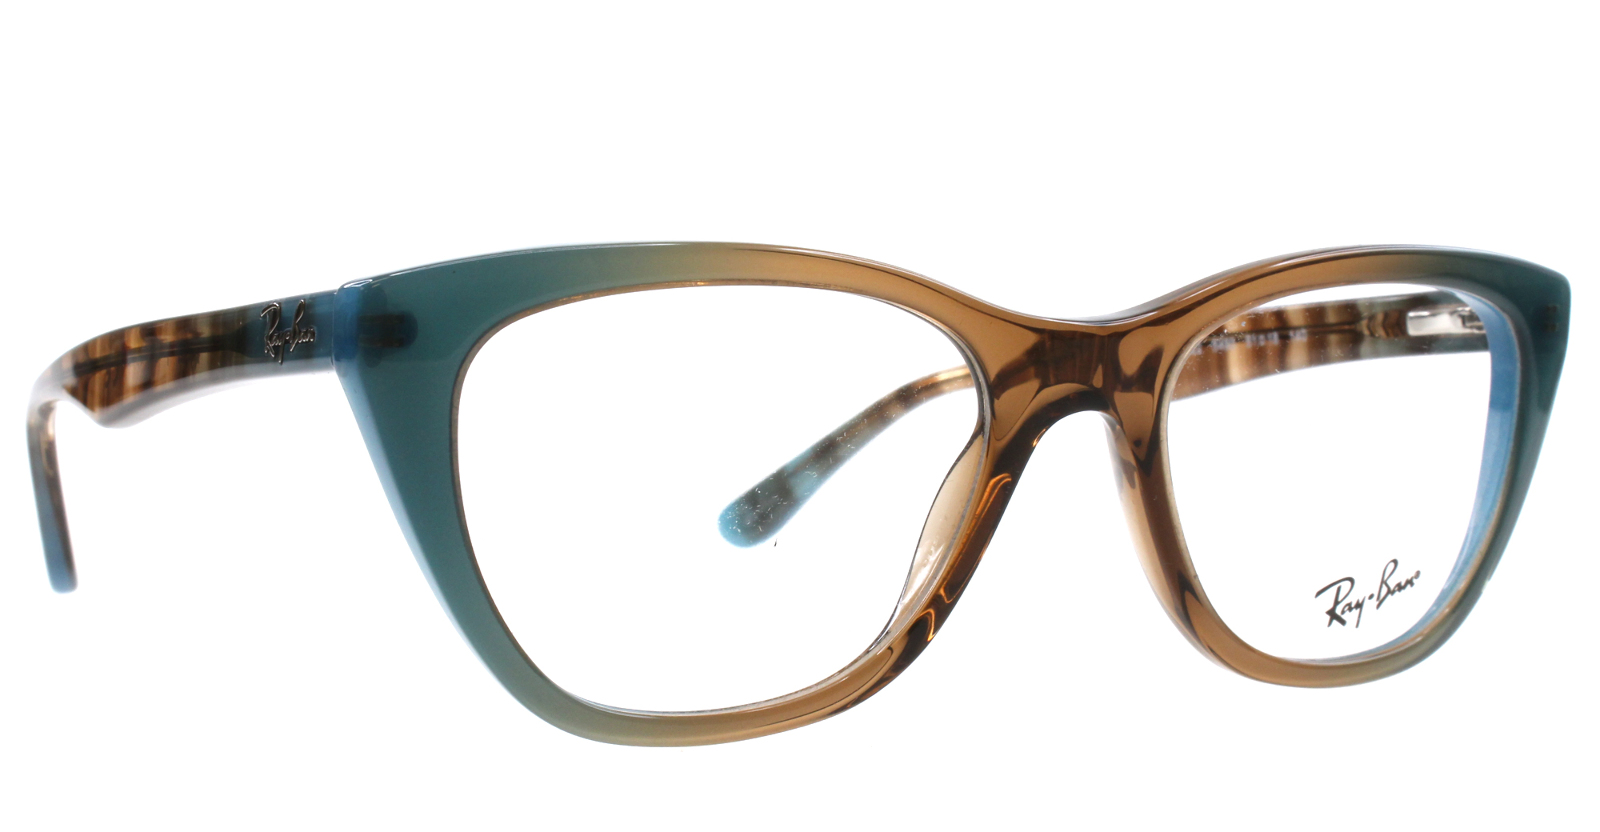 84eb92d172129 Image 1 of 2. Ray Ban RB 5322 5490 Eyeglasses RX ...